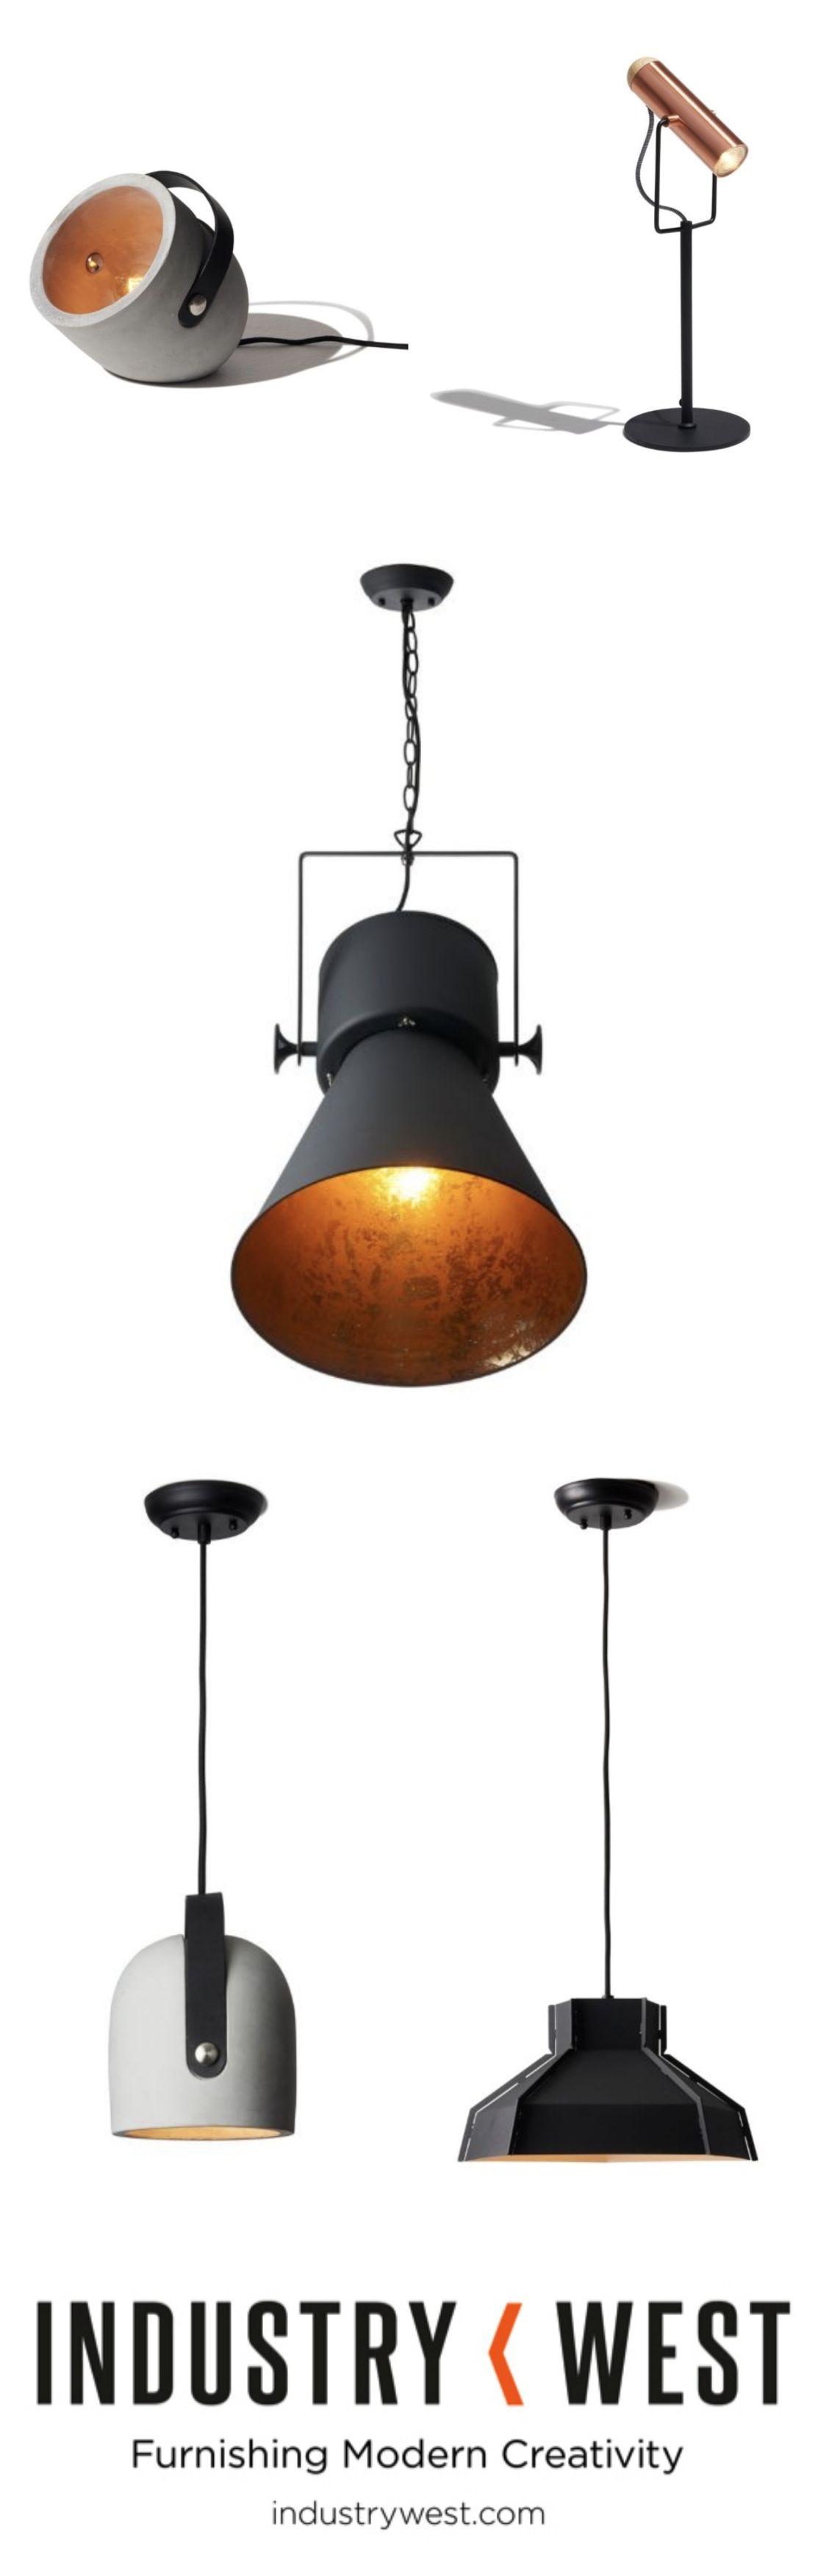 amazoncom gki bethlehem lighting pre lit. Alter Lighting. It Is Hard To Overstate The Role Light Plays In Our Daily Lives Amazoncom Gki Bethlehem Lighting Pre Lit